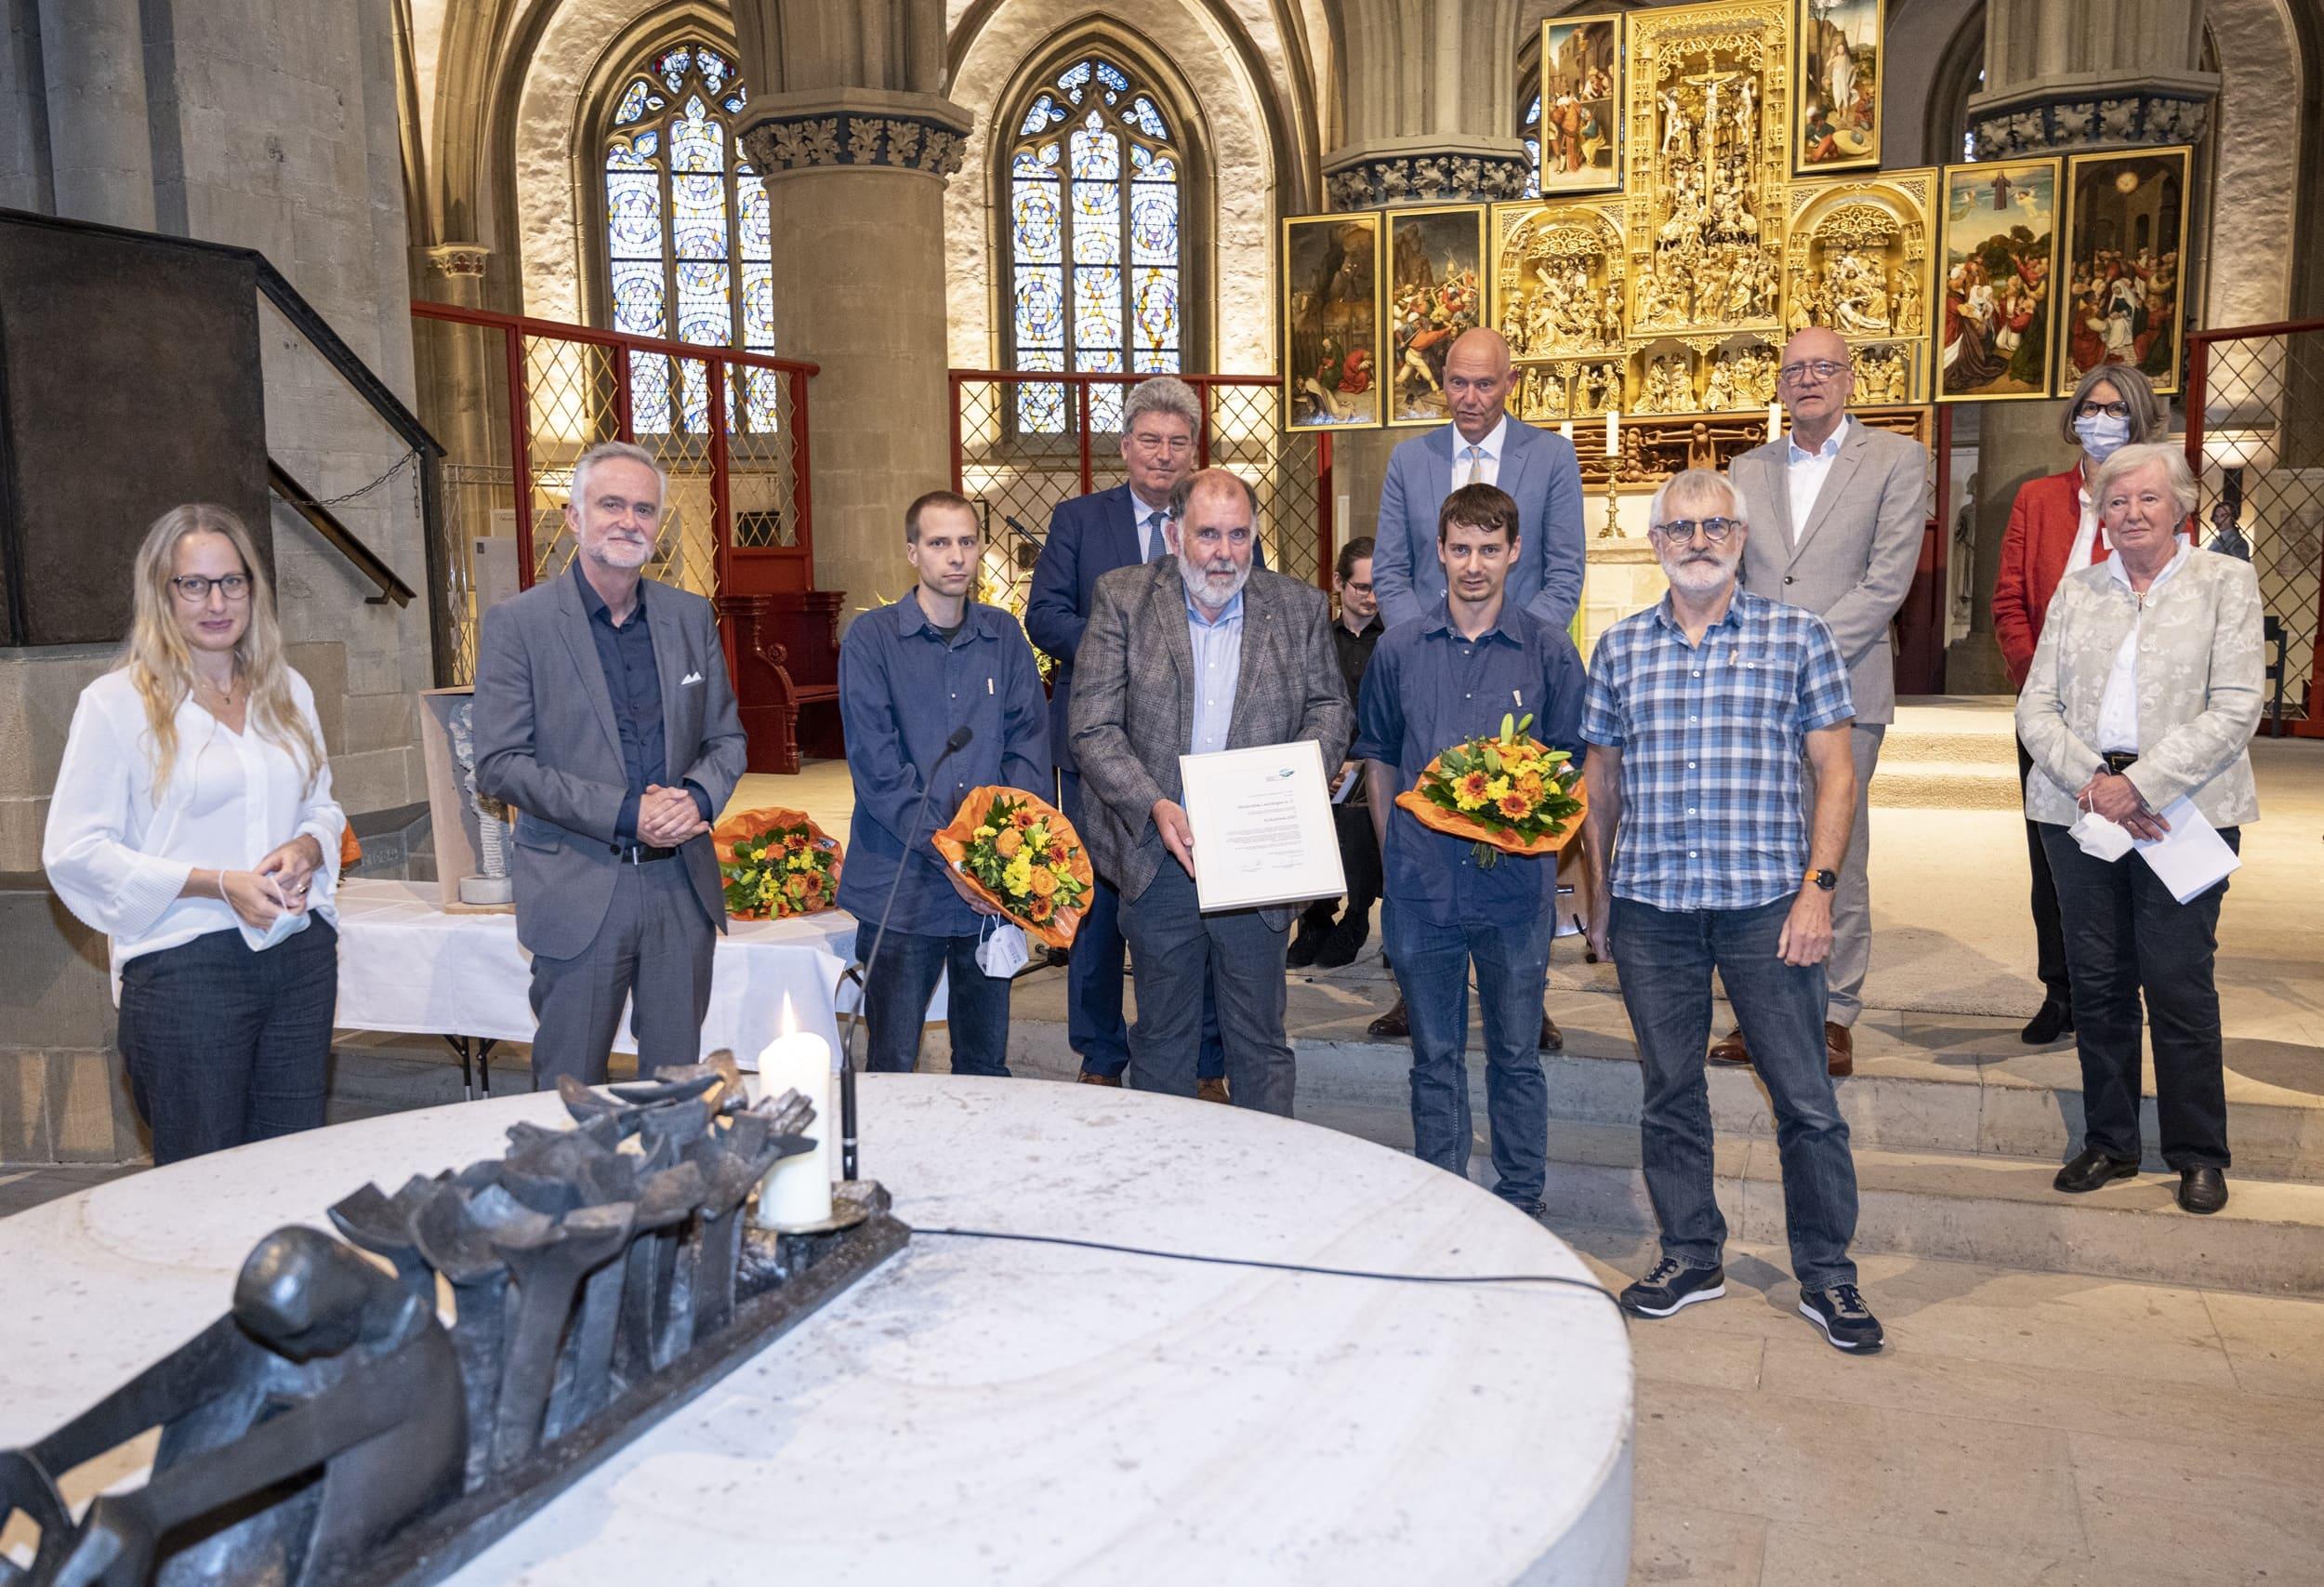 ltag_2020_2021_preisverleihung_lechtinger_muehle_3 (c) Hermann Pentermann